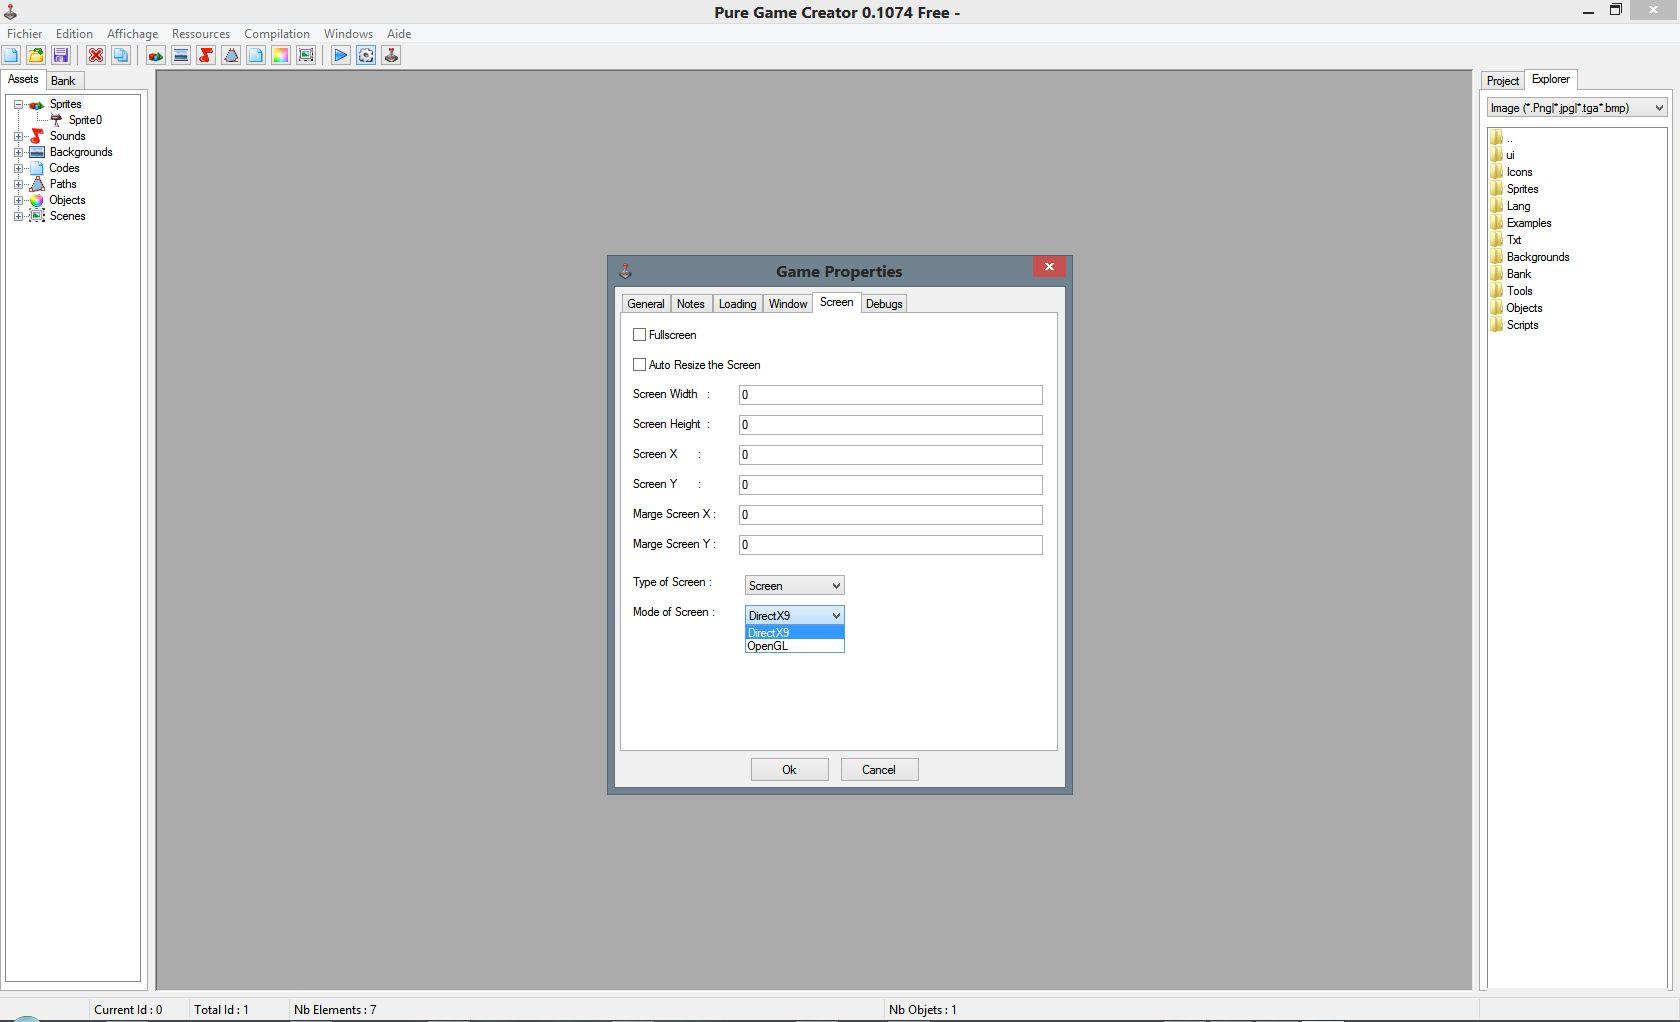 Logiciel : Editeur de jeu Screenshot0.1_gameproperties